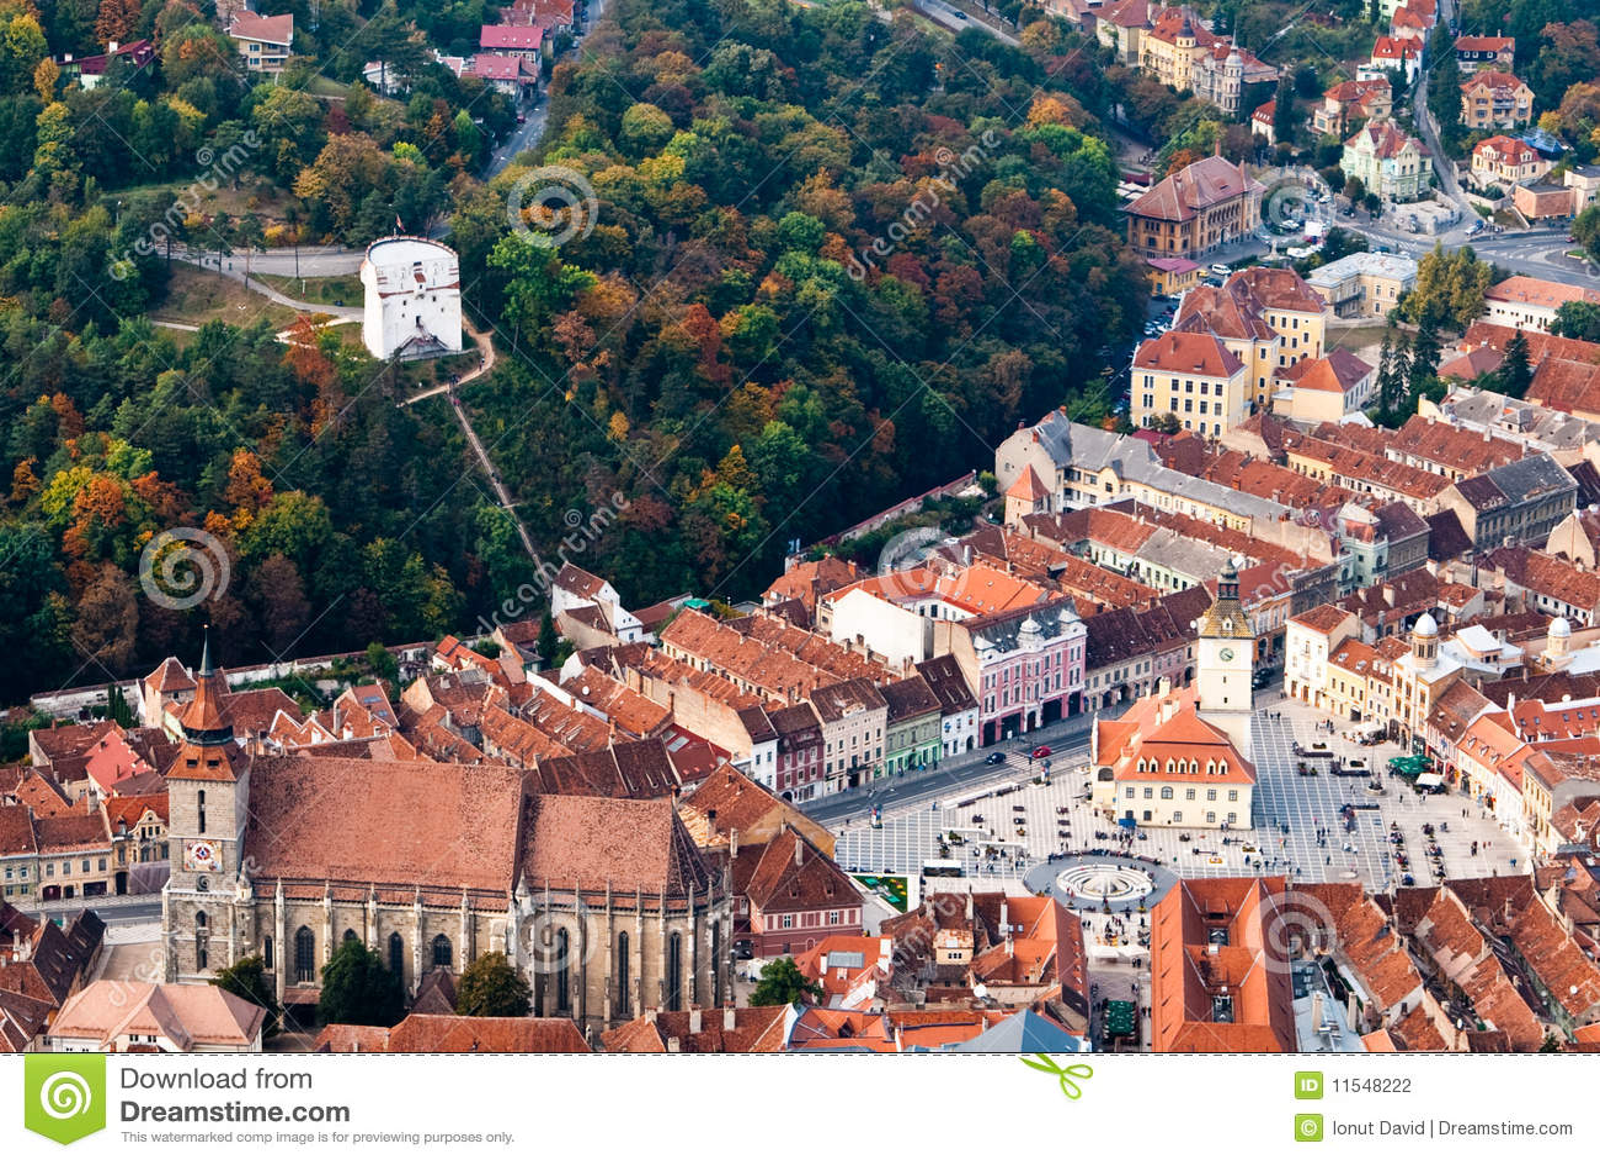 Old center of Brasov city